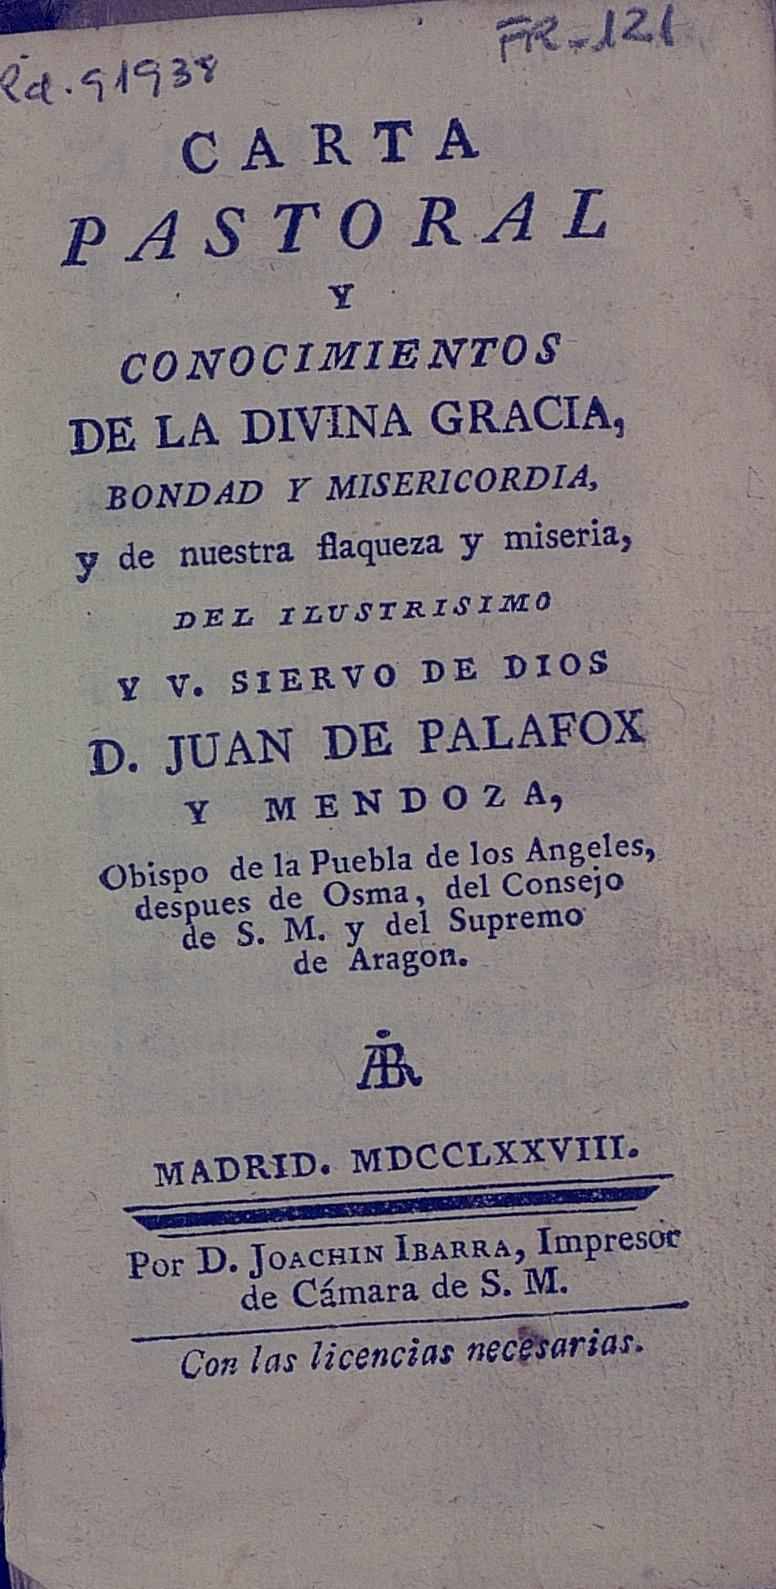 Carta pastoral, 1778